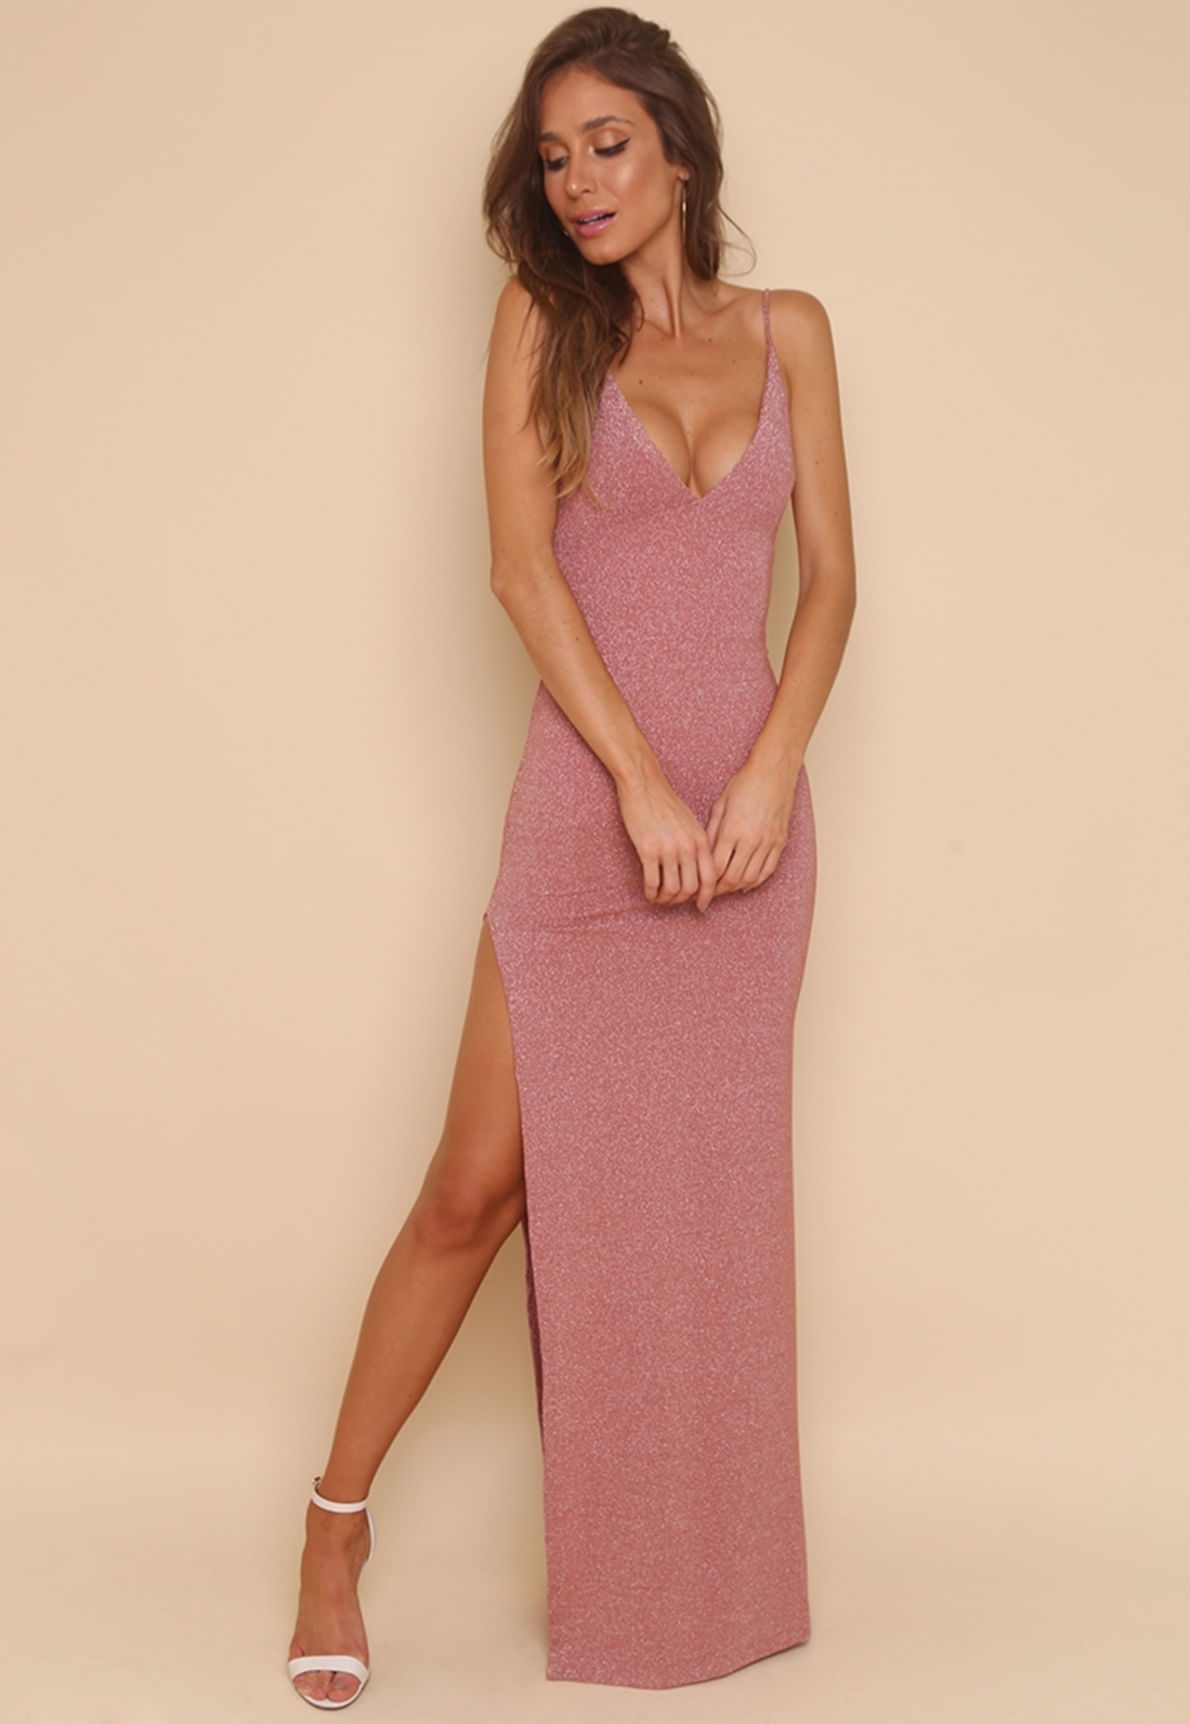 27445-vestido-longo-rose-sabrine-mundo-lolita-02